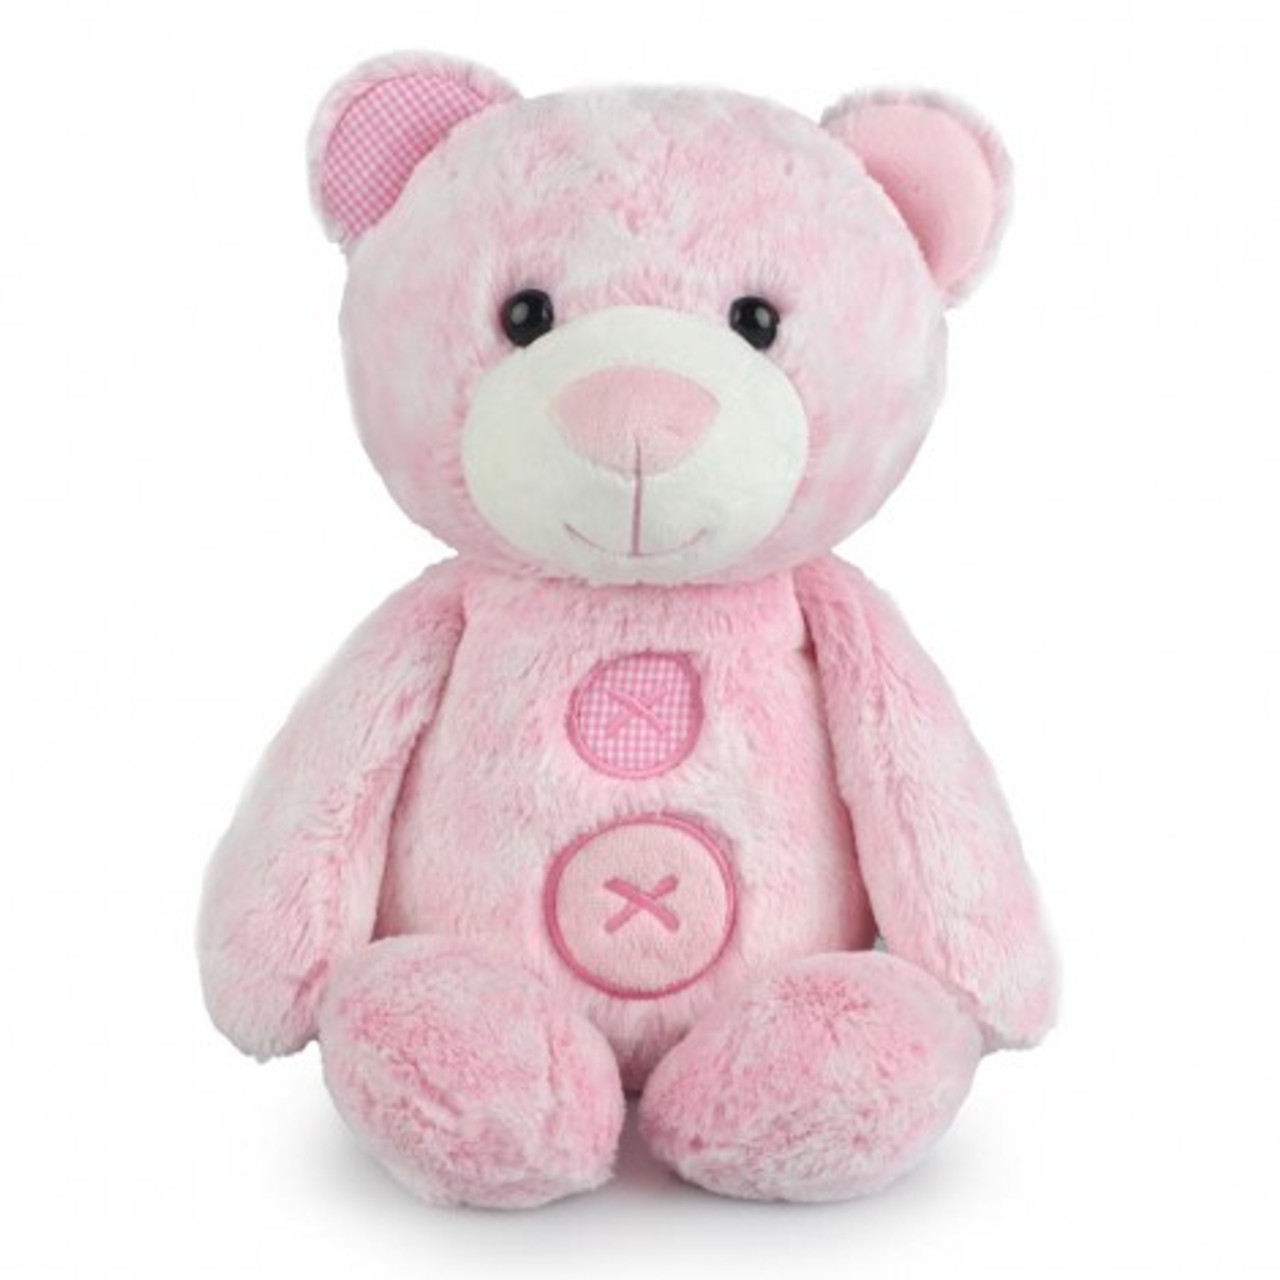 Korimco Patches the Bear Soft Plush Teddy Bear Large 40cm - PINK